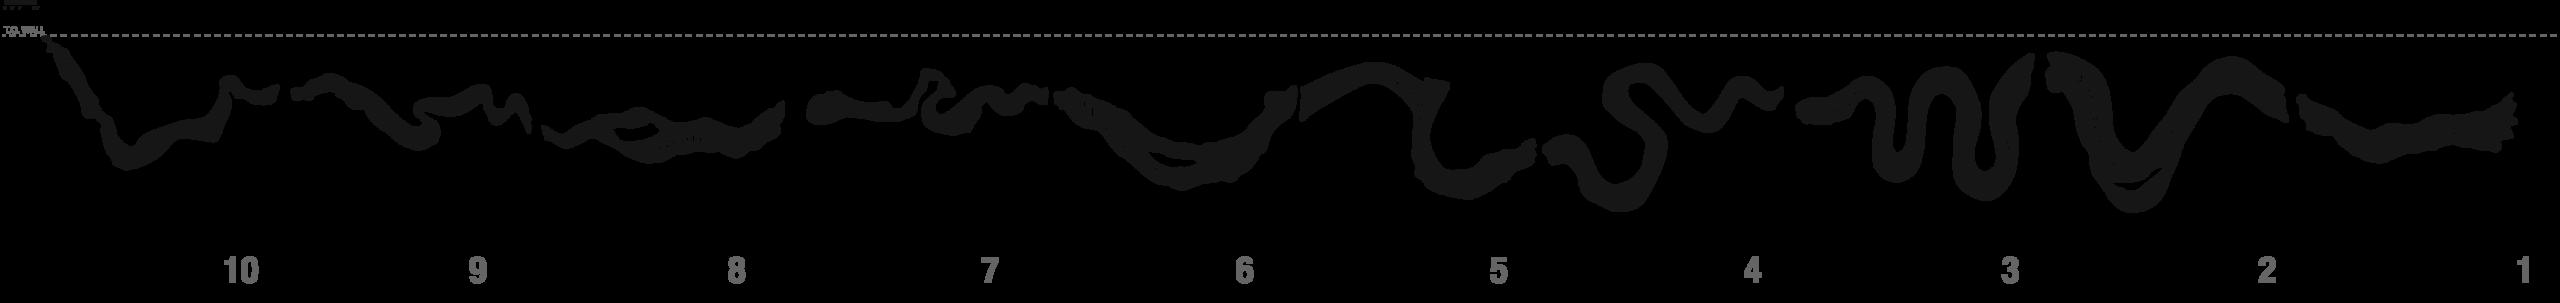 ATR-panel-layouts-1